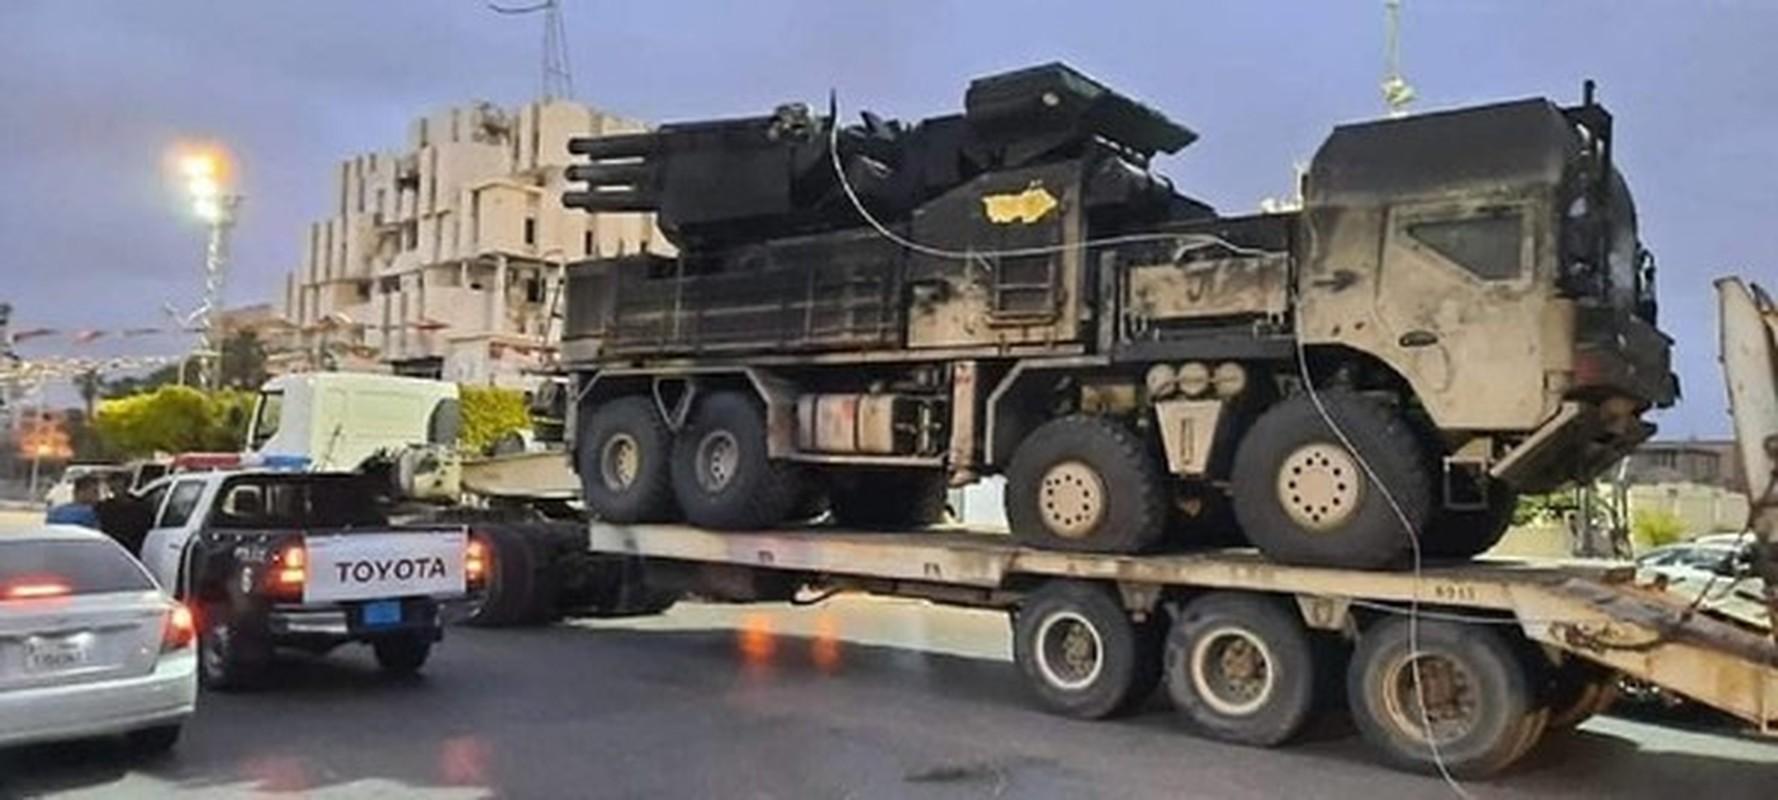 Vi sao huyen thoai S-300 cua Armenia vo vun truoc UAV Azerbaijan?-Hinh-7